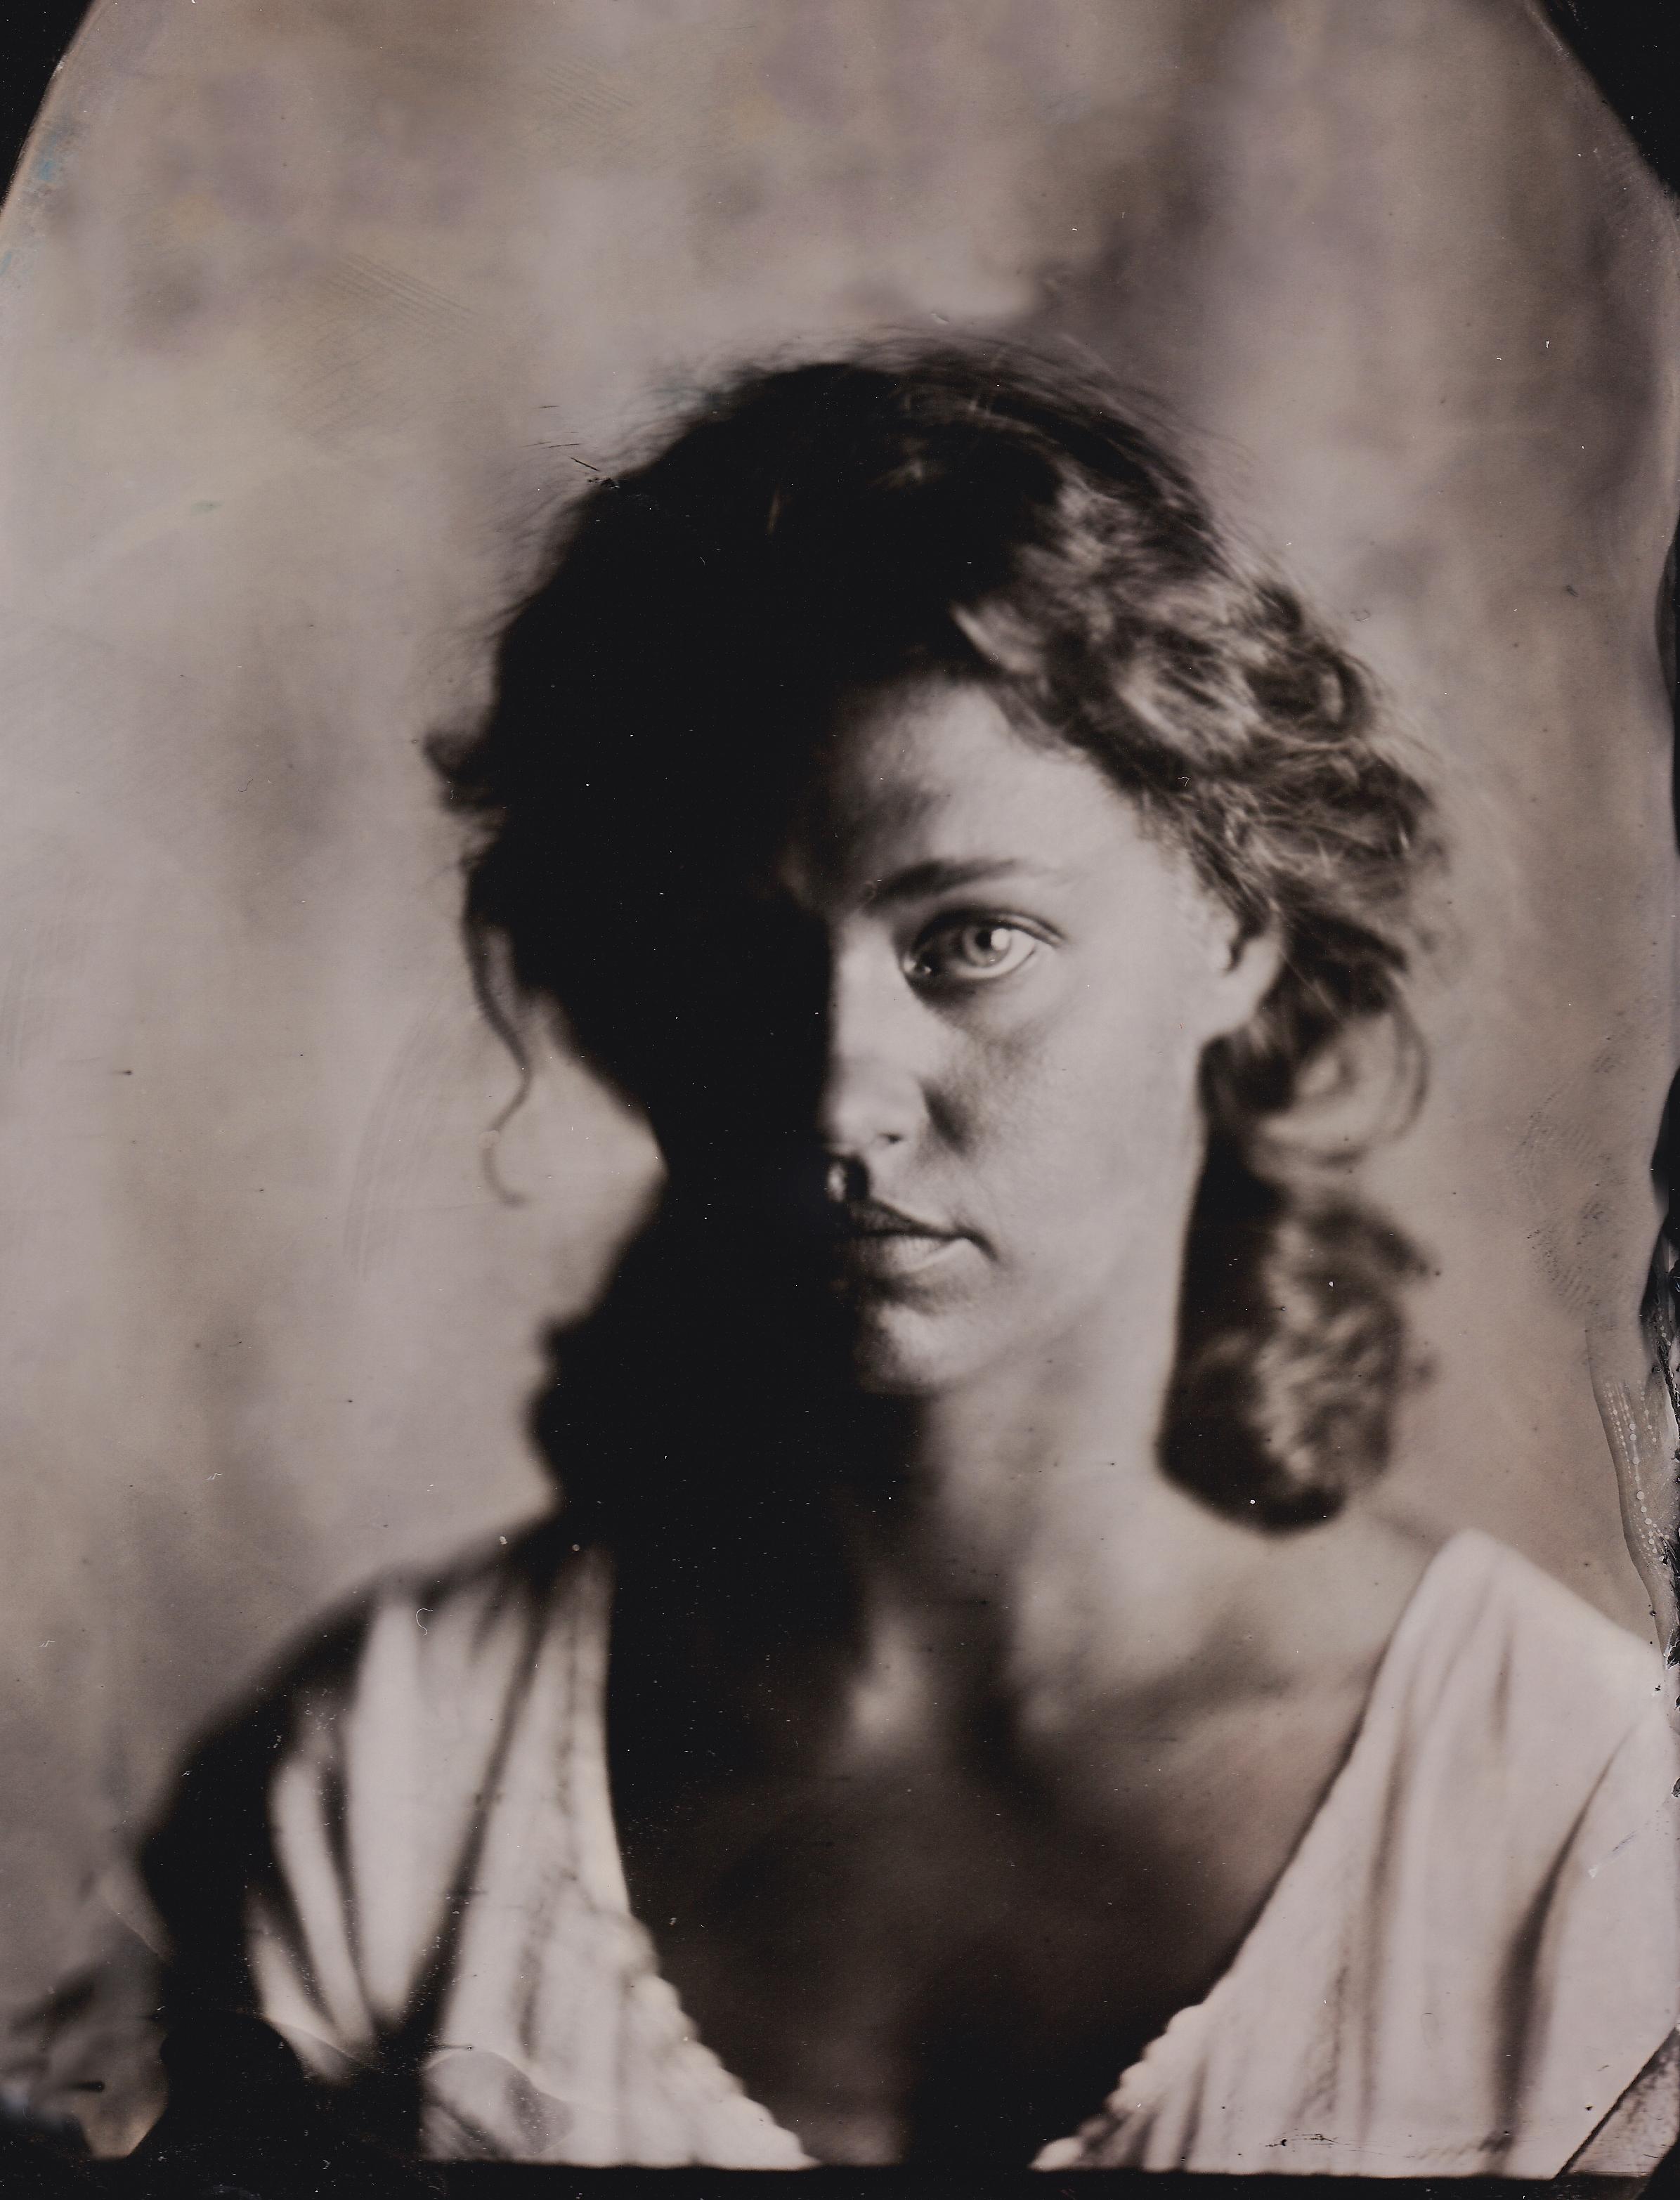 Portrait: Leah  4x6 Tintype  Three Graces Studio  May 2016